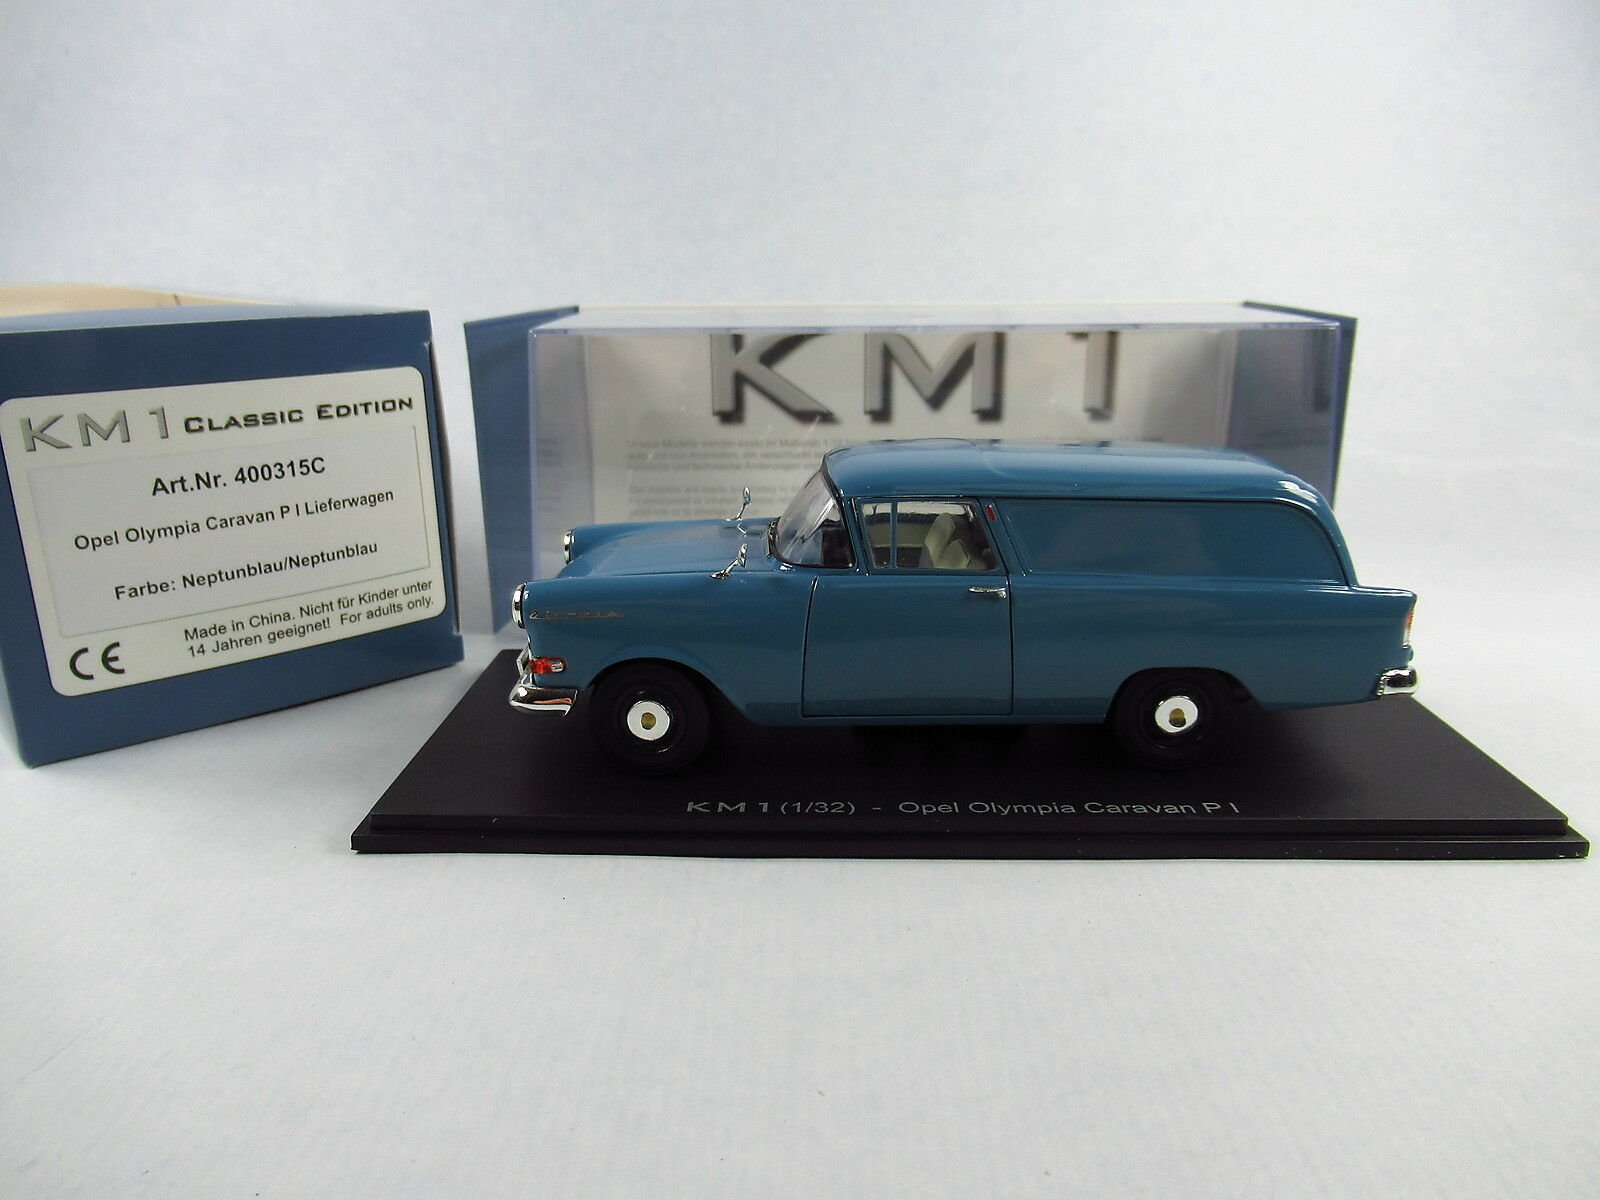 Km1-Opel oylmpia Caravane p1-neptunbleu Camionnette - 1 32 - Artnr. 400315 C